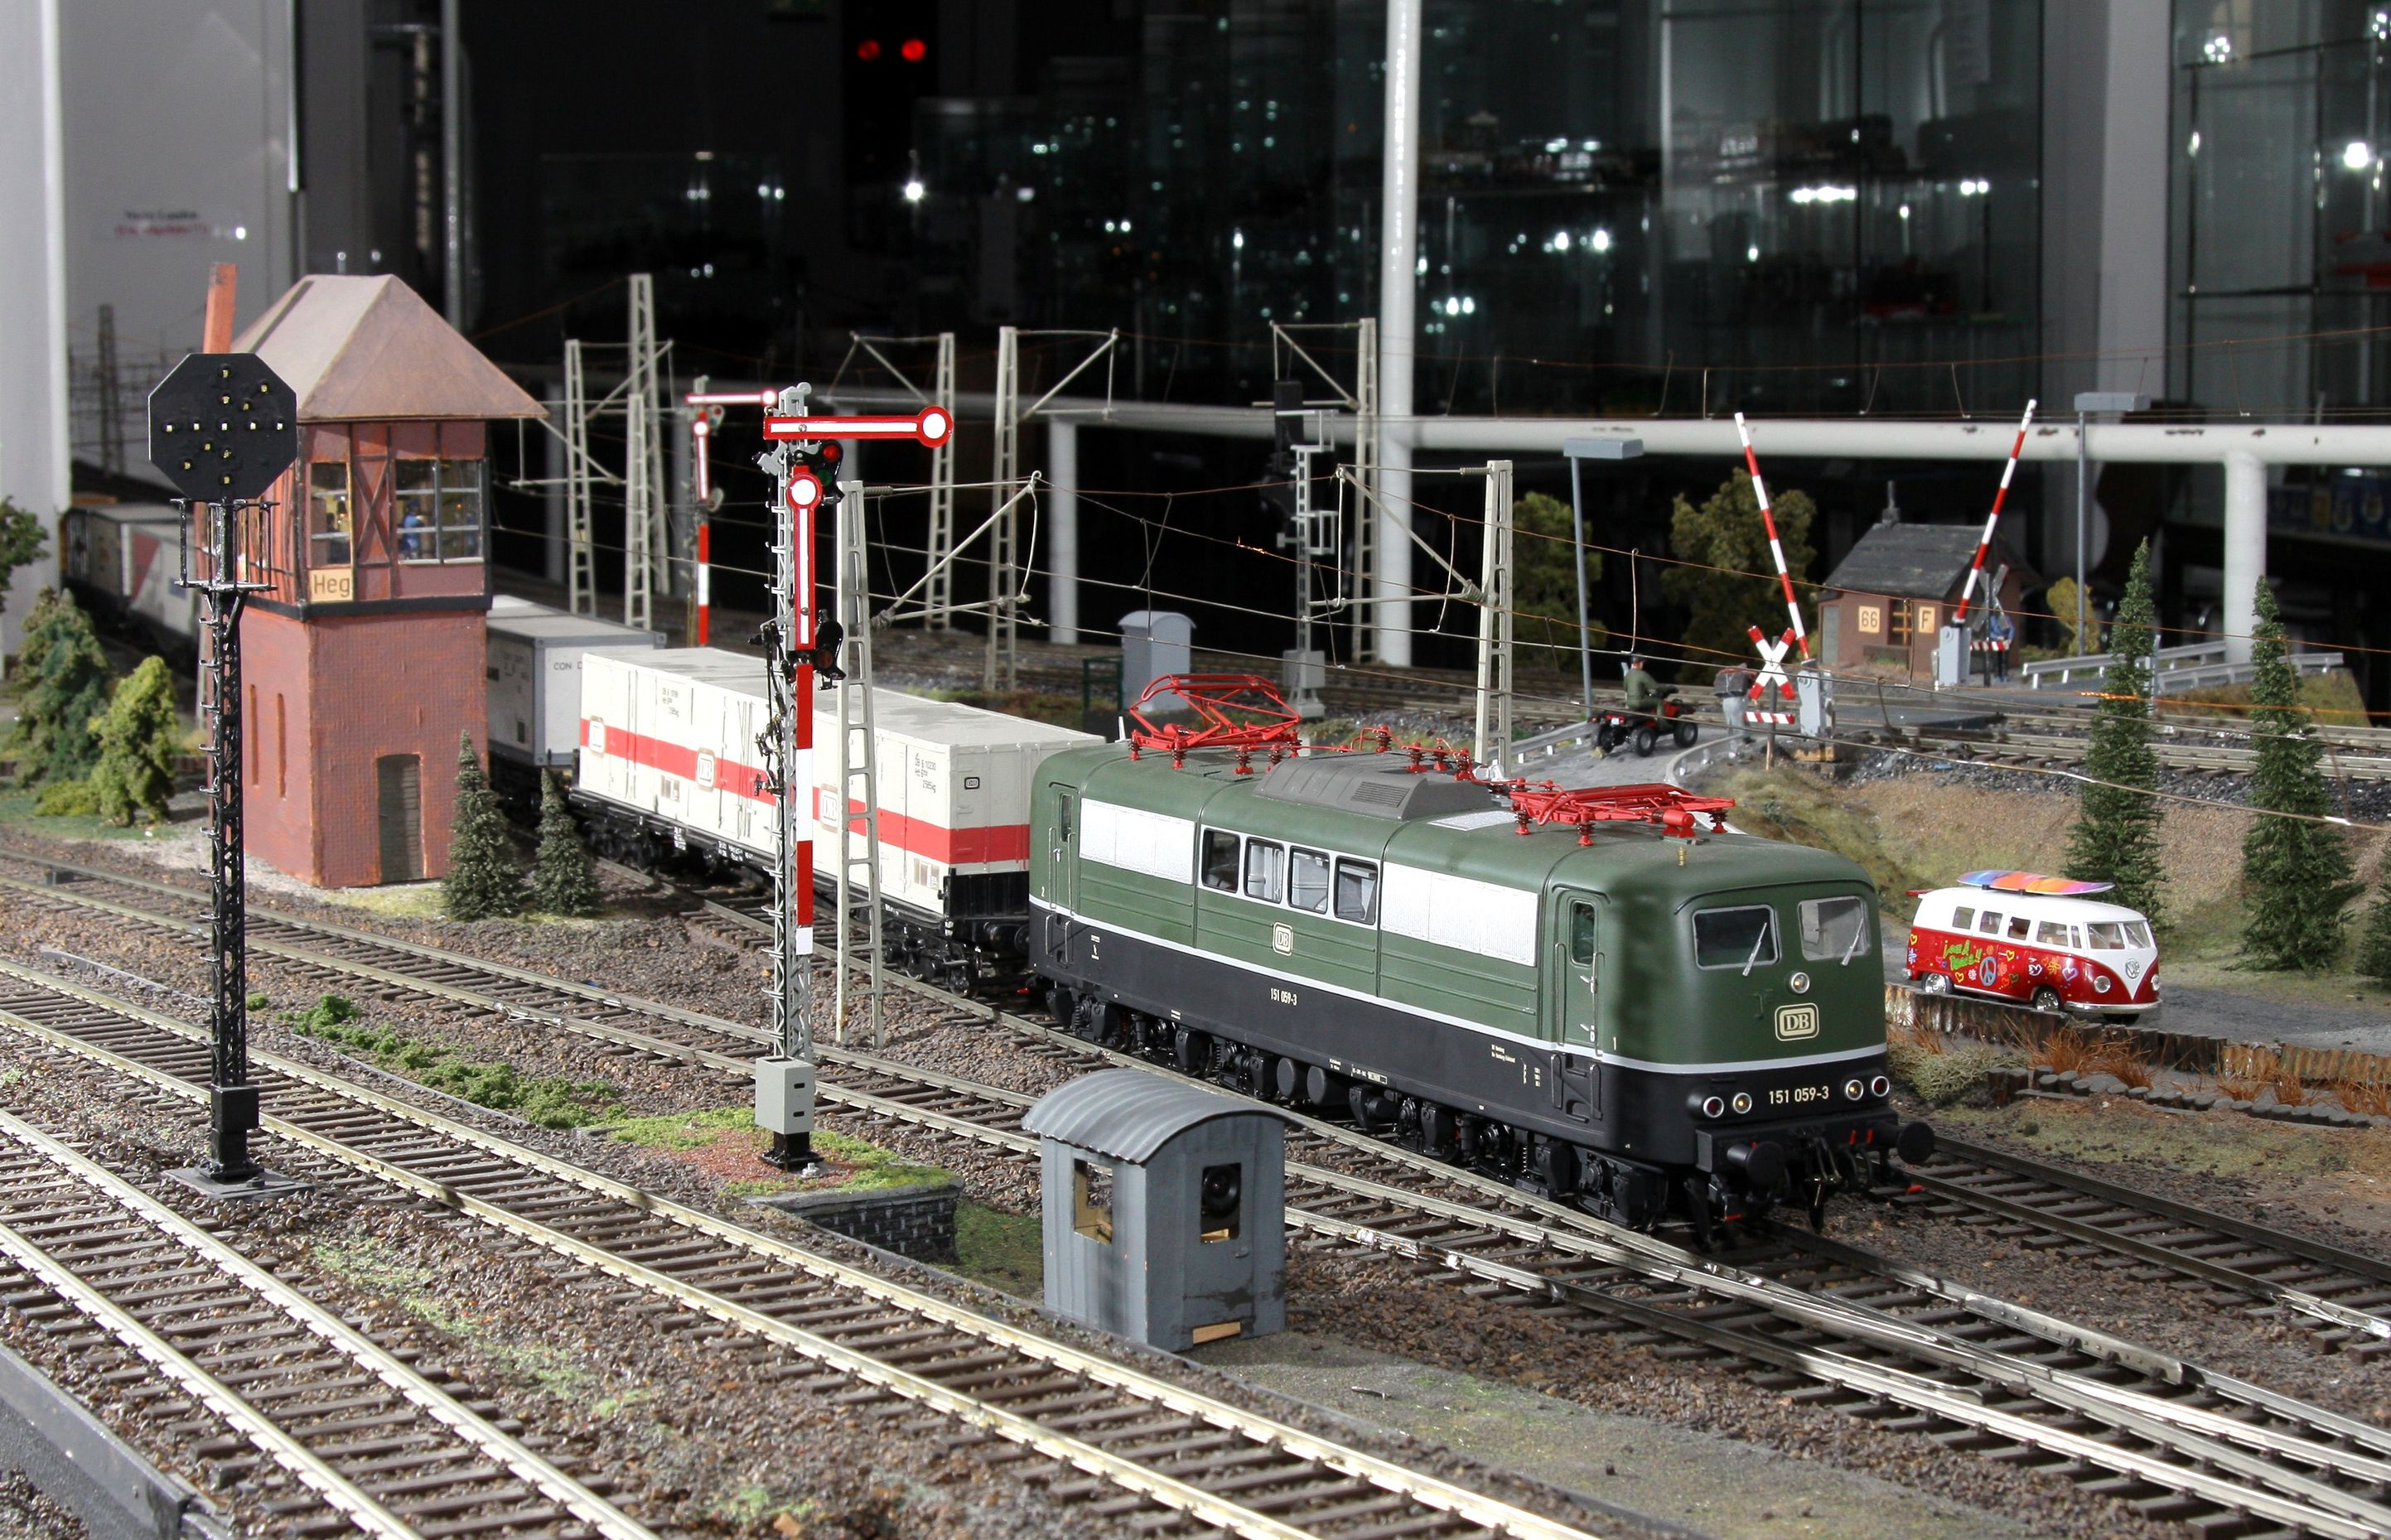 Modelleisenbahn Hamburg - Wikiwand